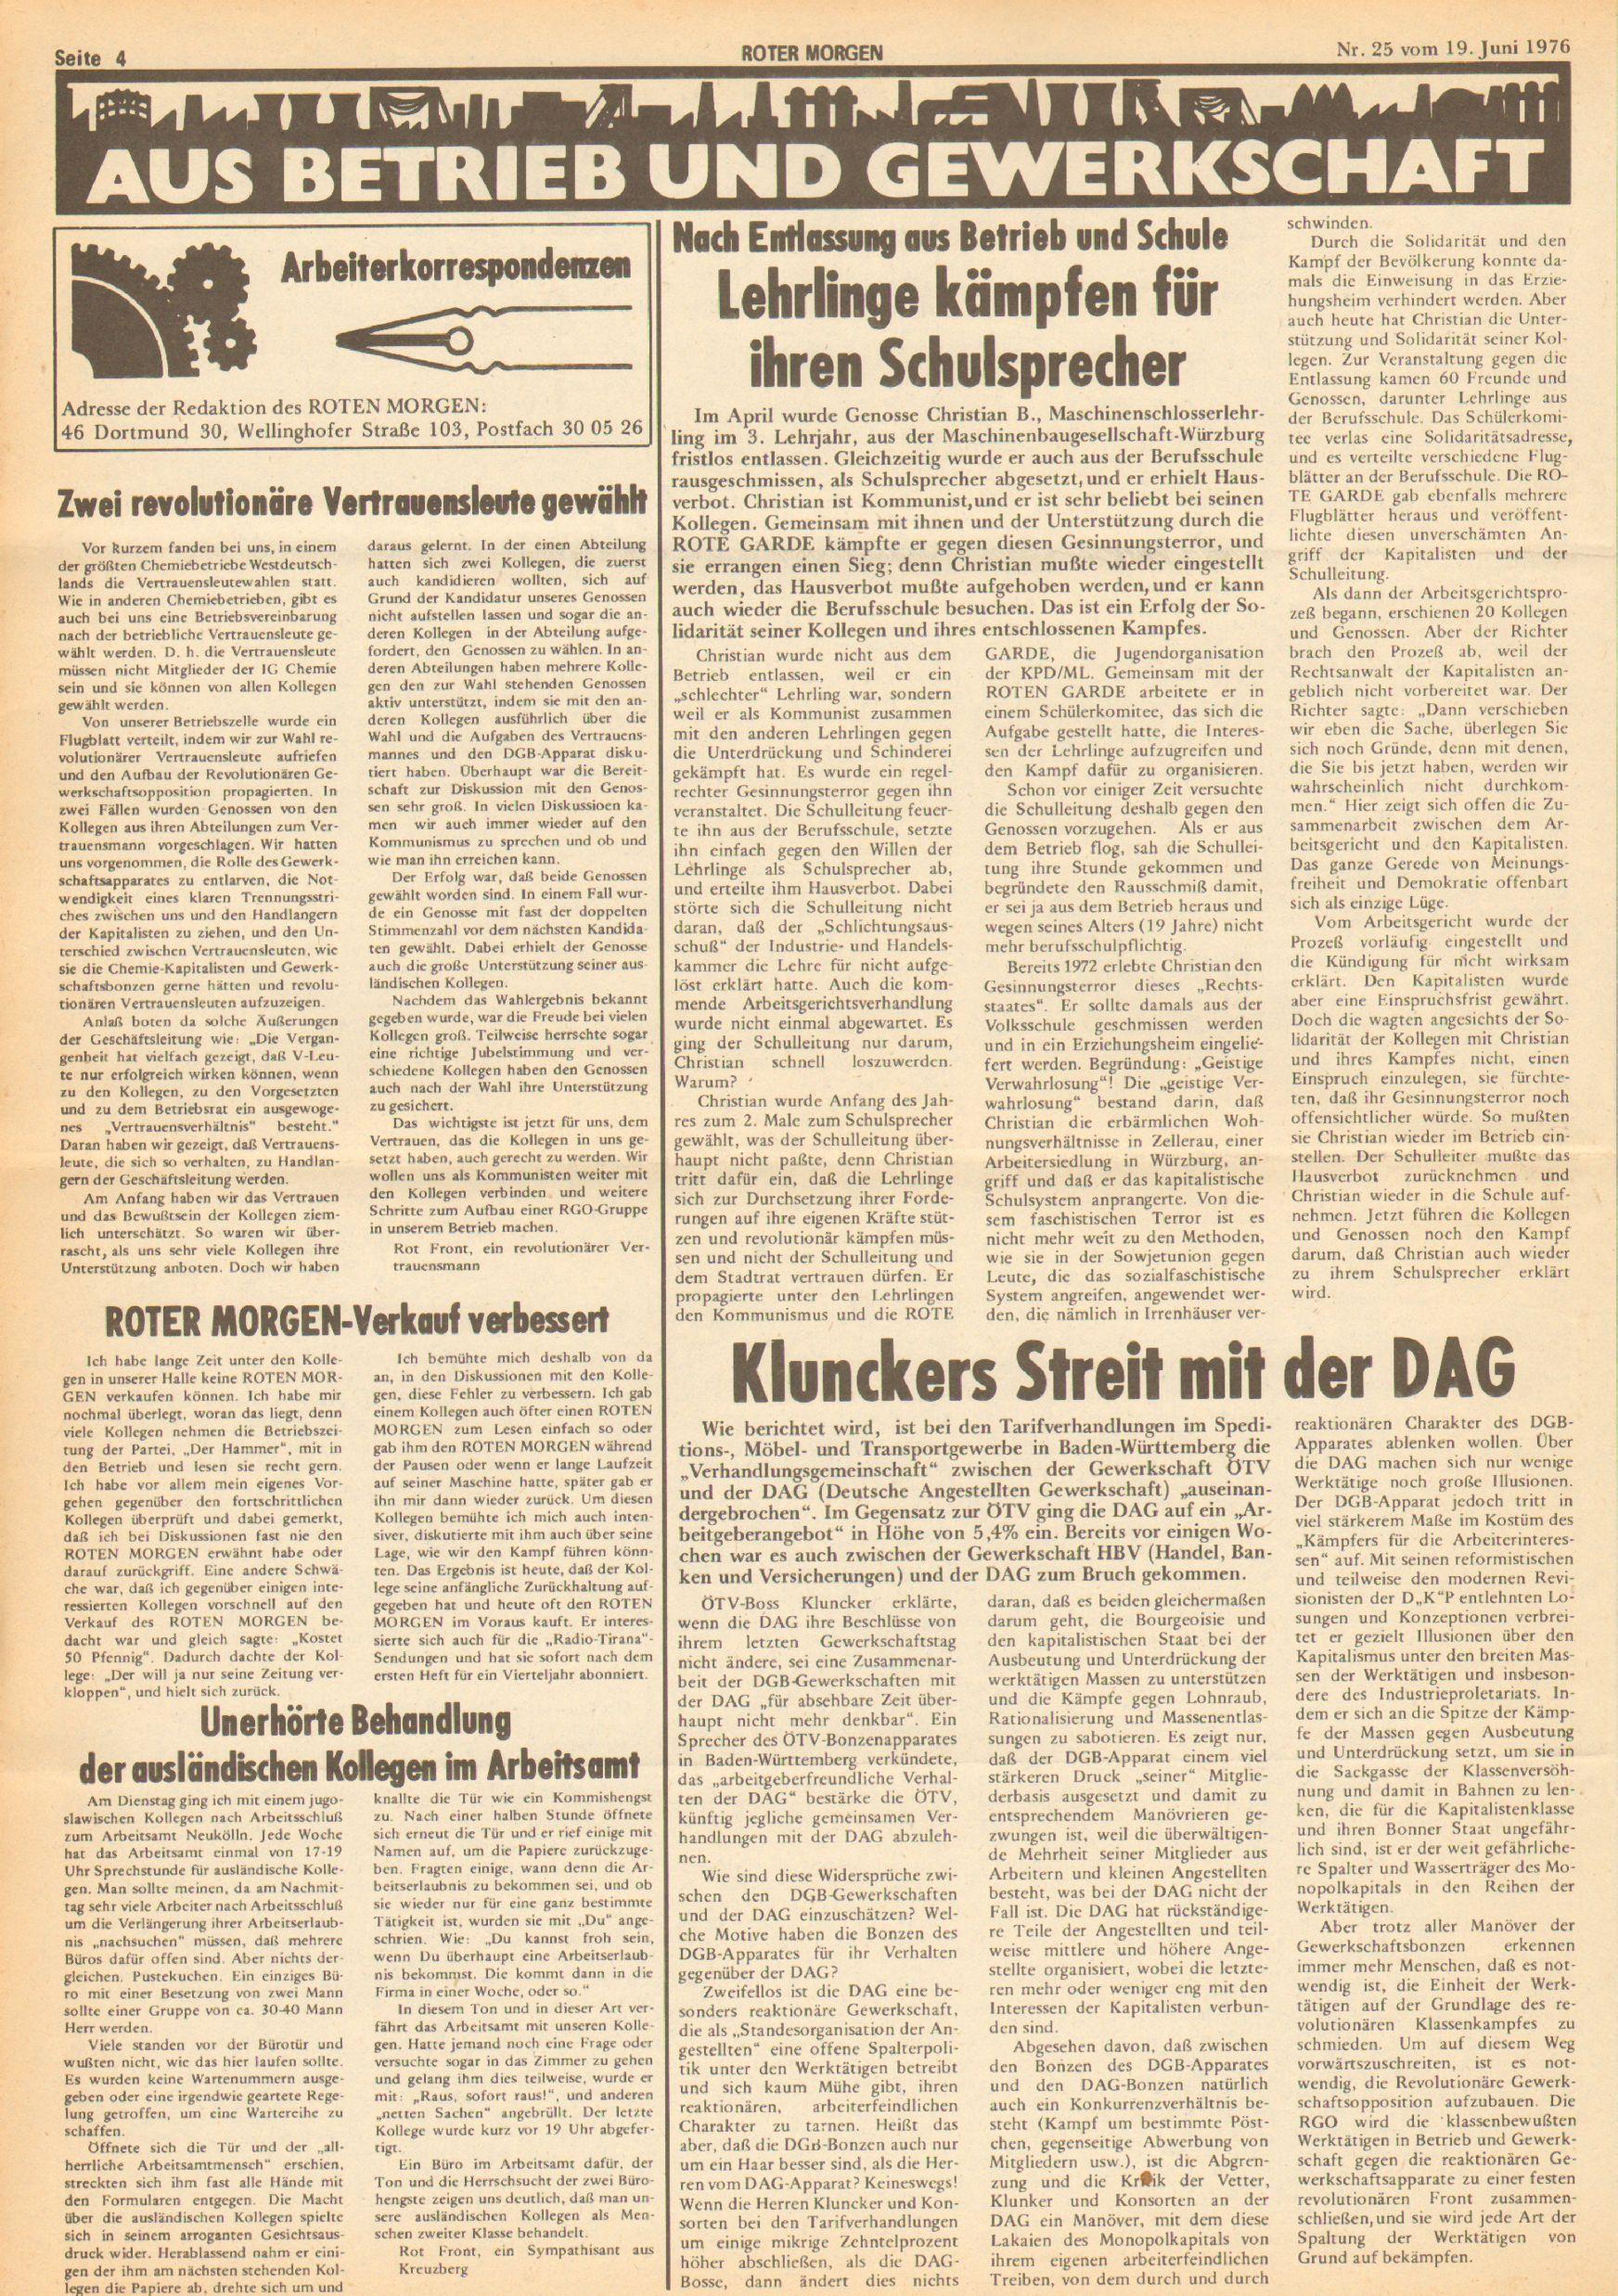 Roter Morgen, 10. Jg., 19. Juni 1976, Nr. 25, Seite 4